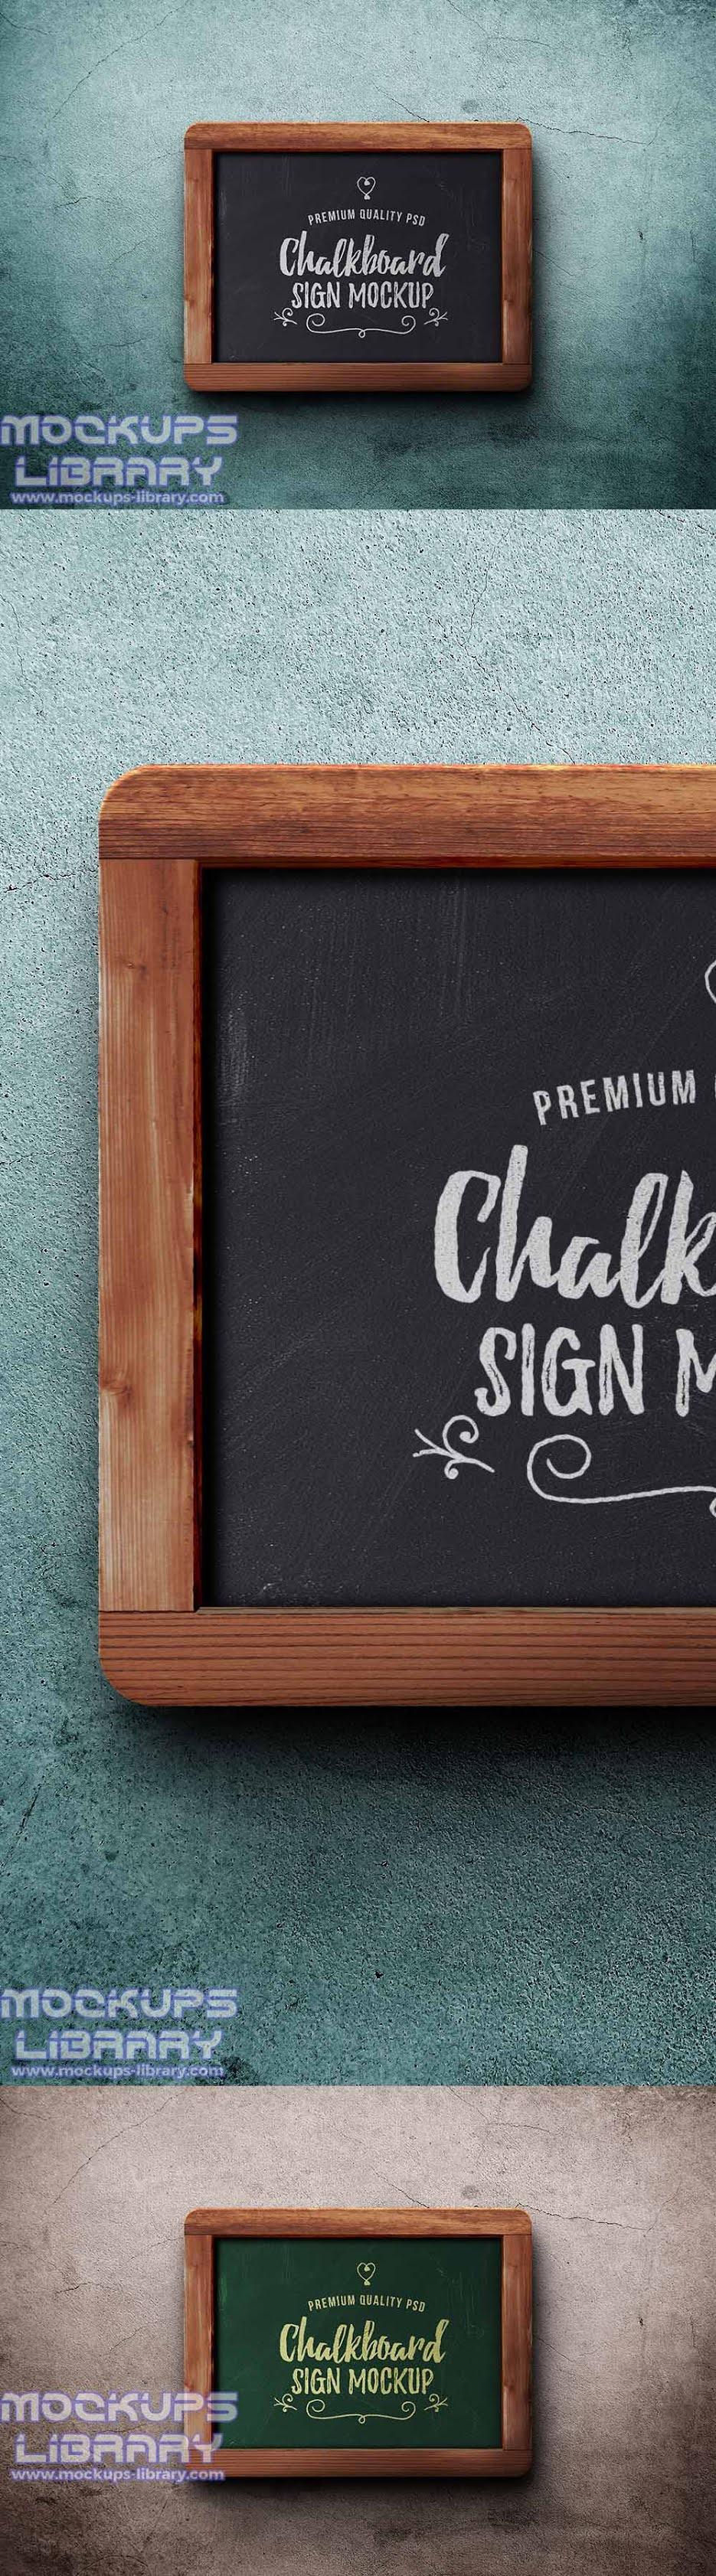 chalkboard sign mockup